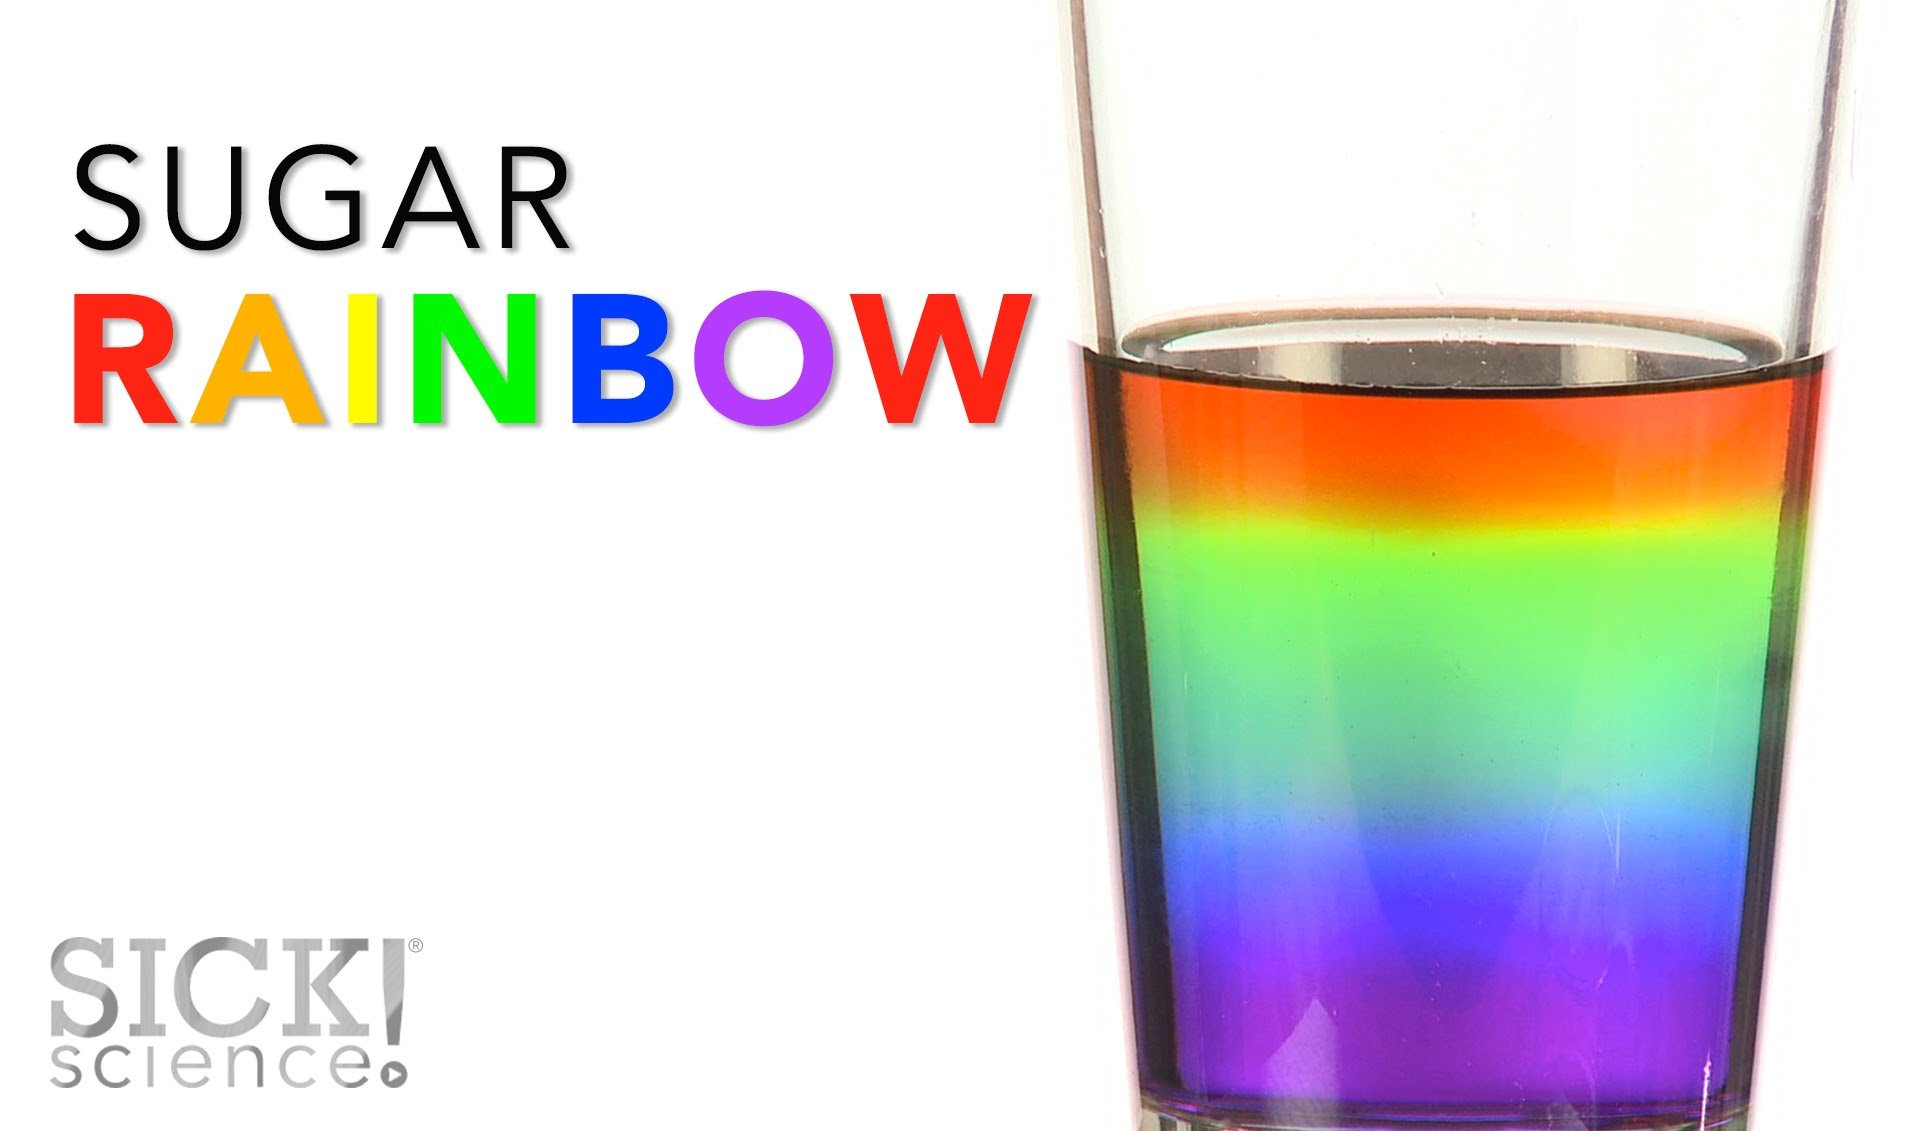 Amazing Rainbow with Sugar!